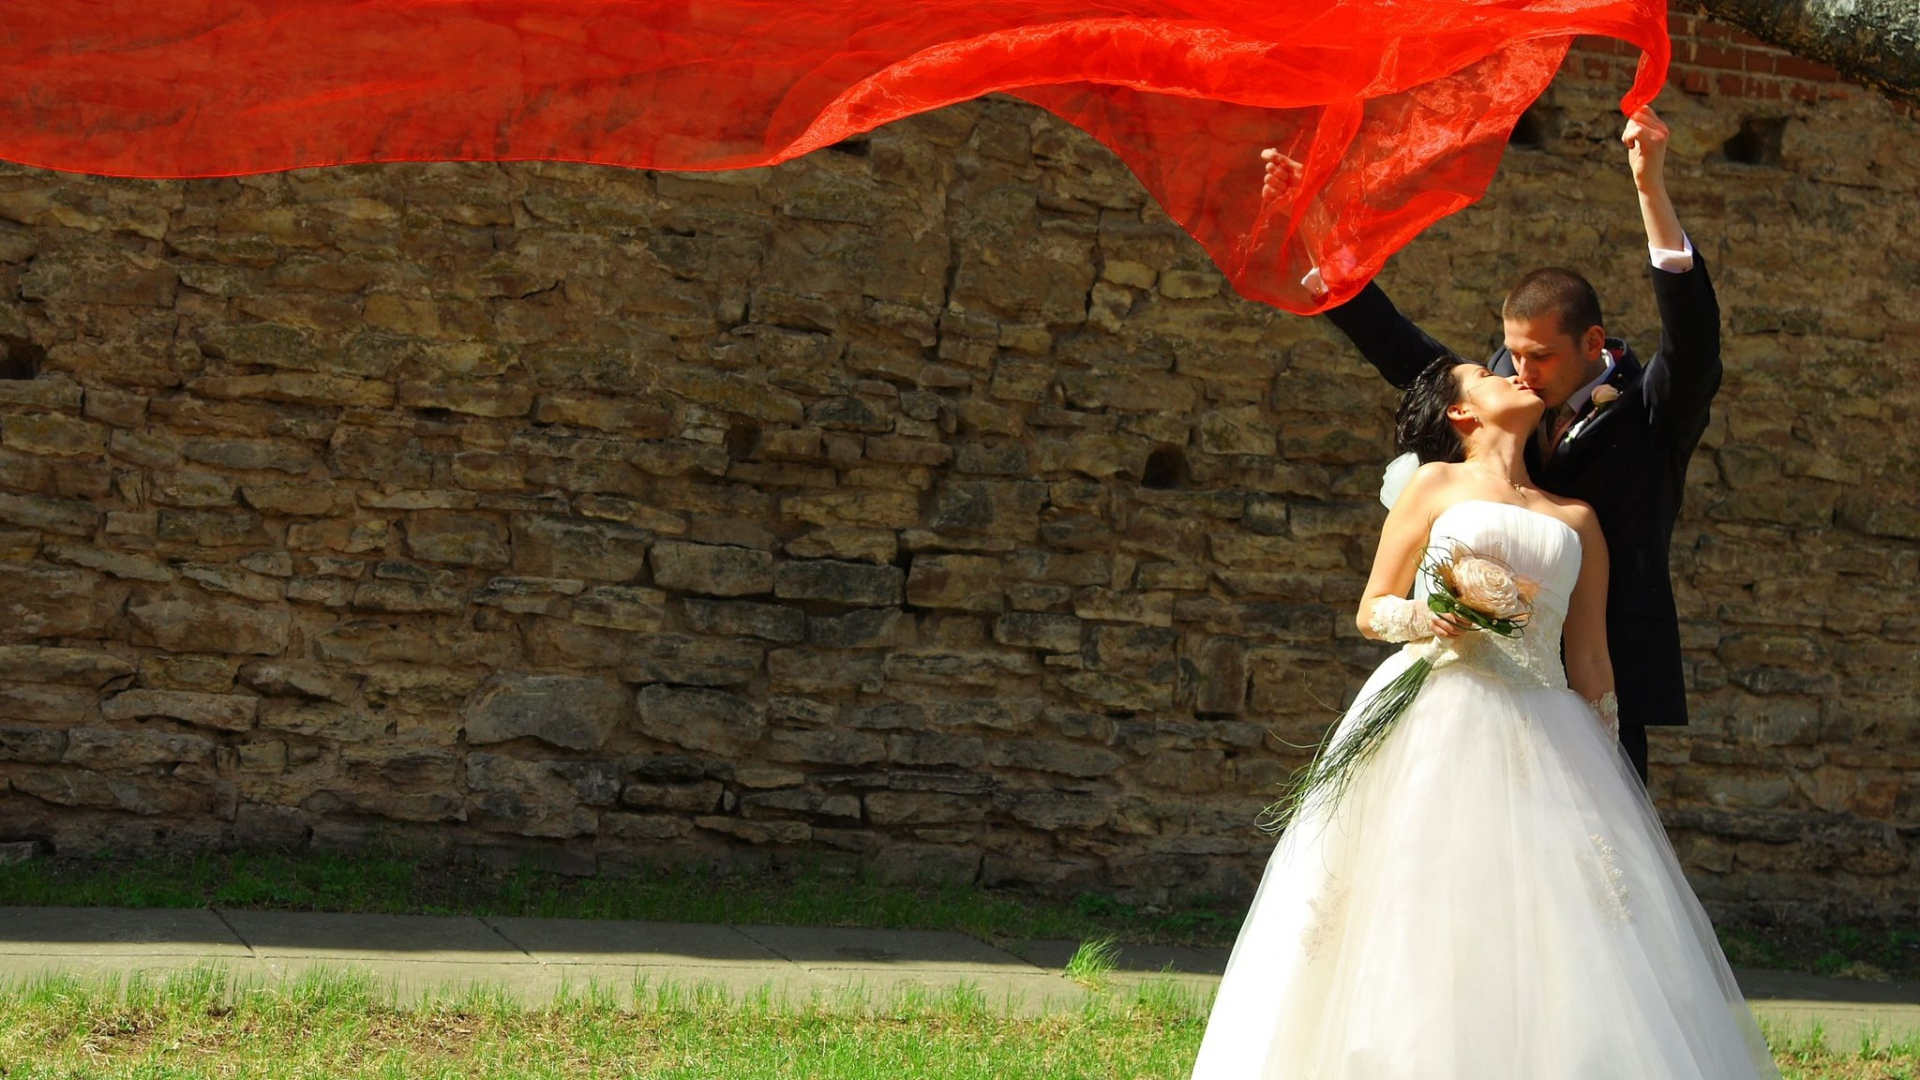 Download Wallpaper 1920x1080 Holiday Wedding Bride Groom Red